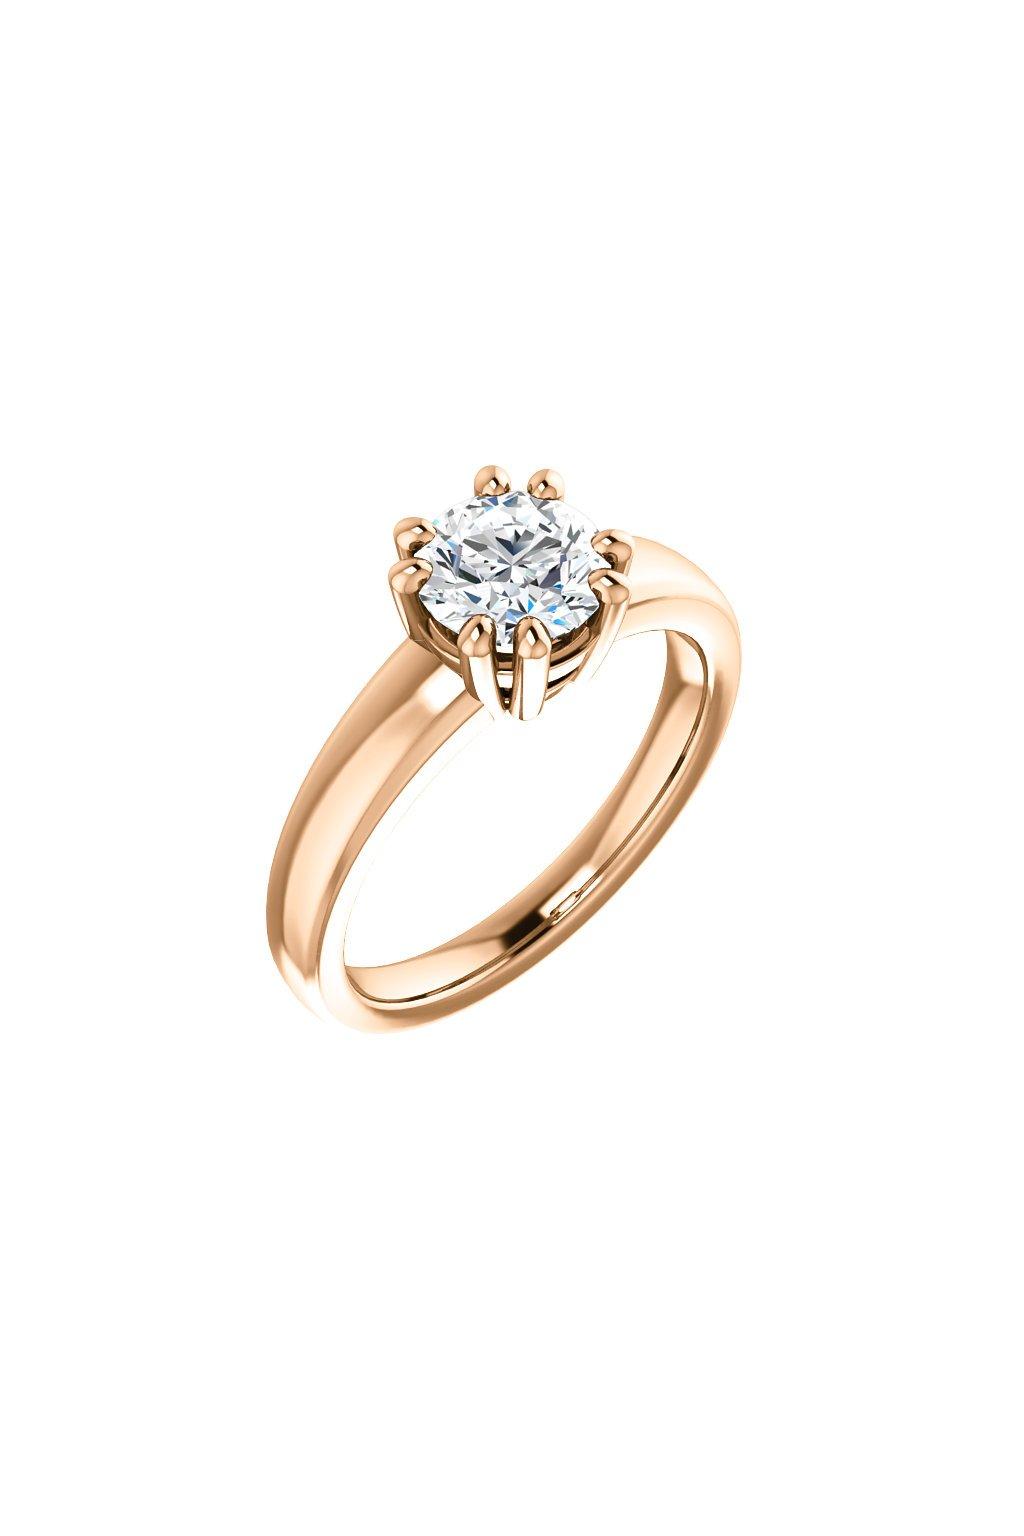 Zásnubní prsten ROYALIS QUEEN s Diamantem